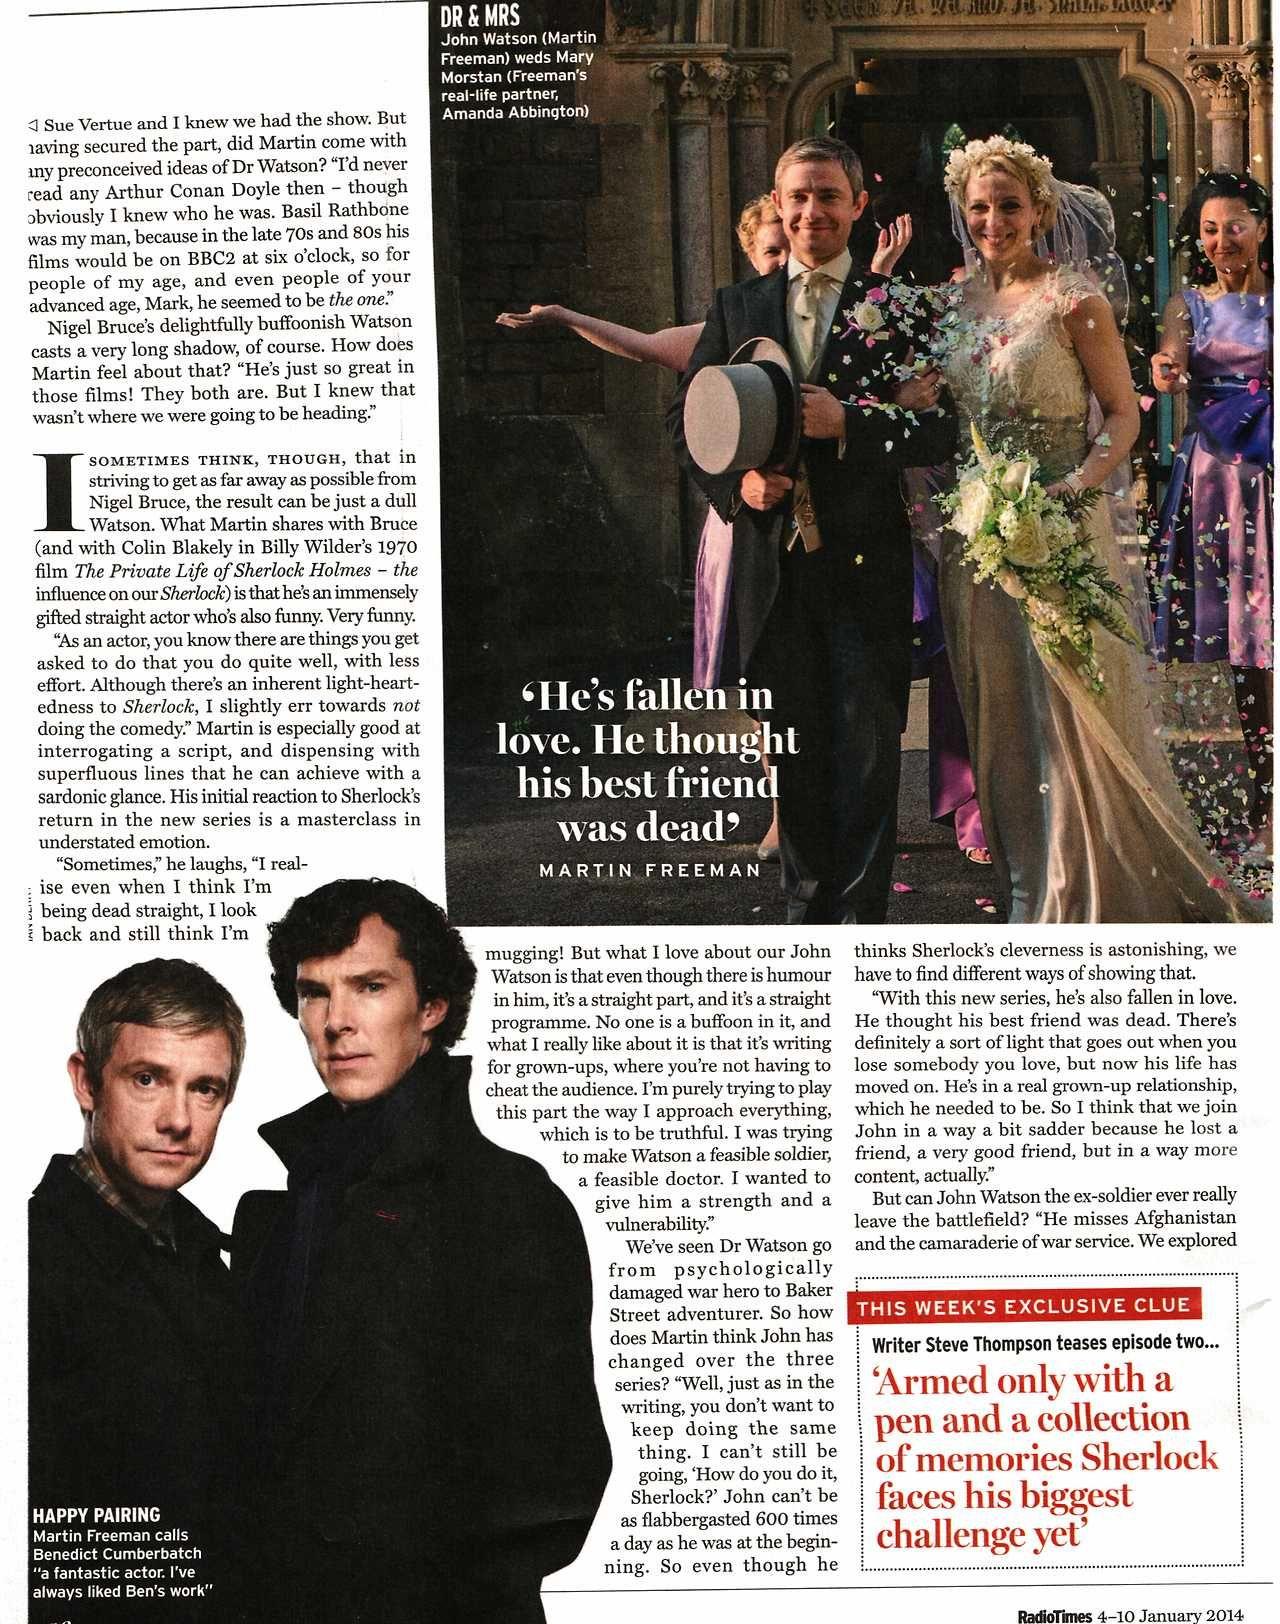 Radio Times, 4-10 January, 2014 (4)